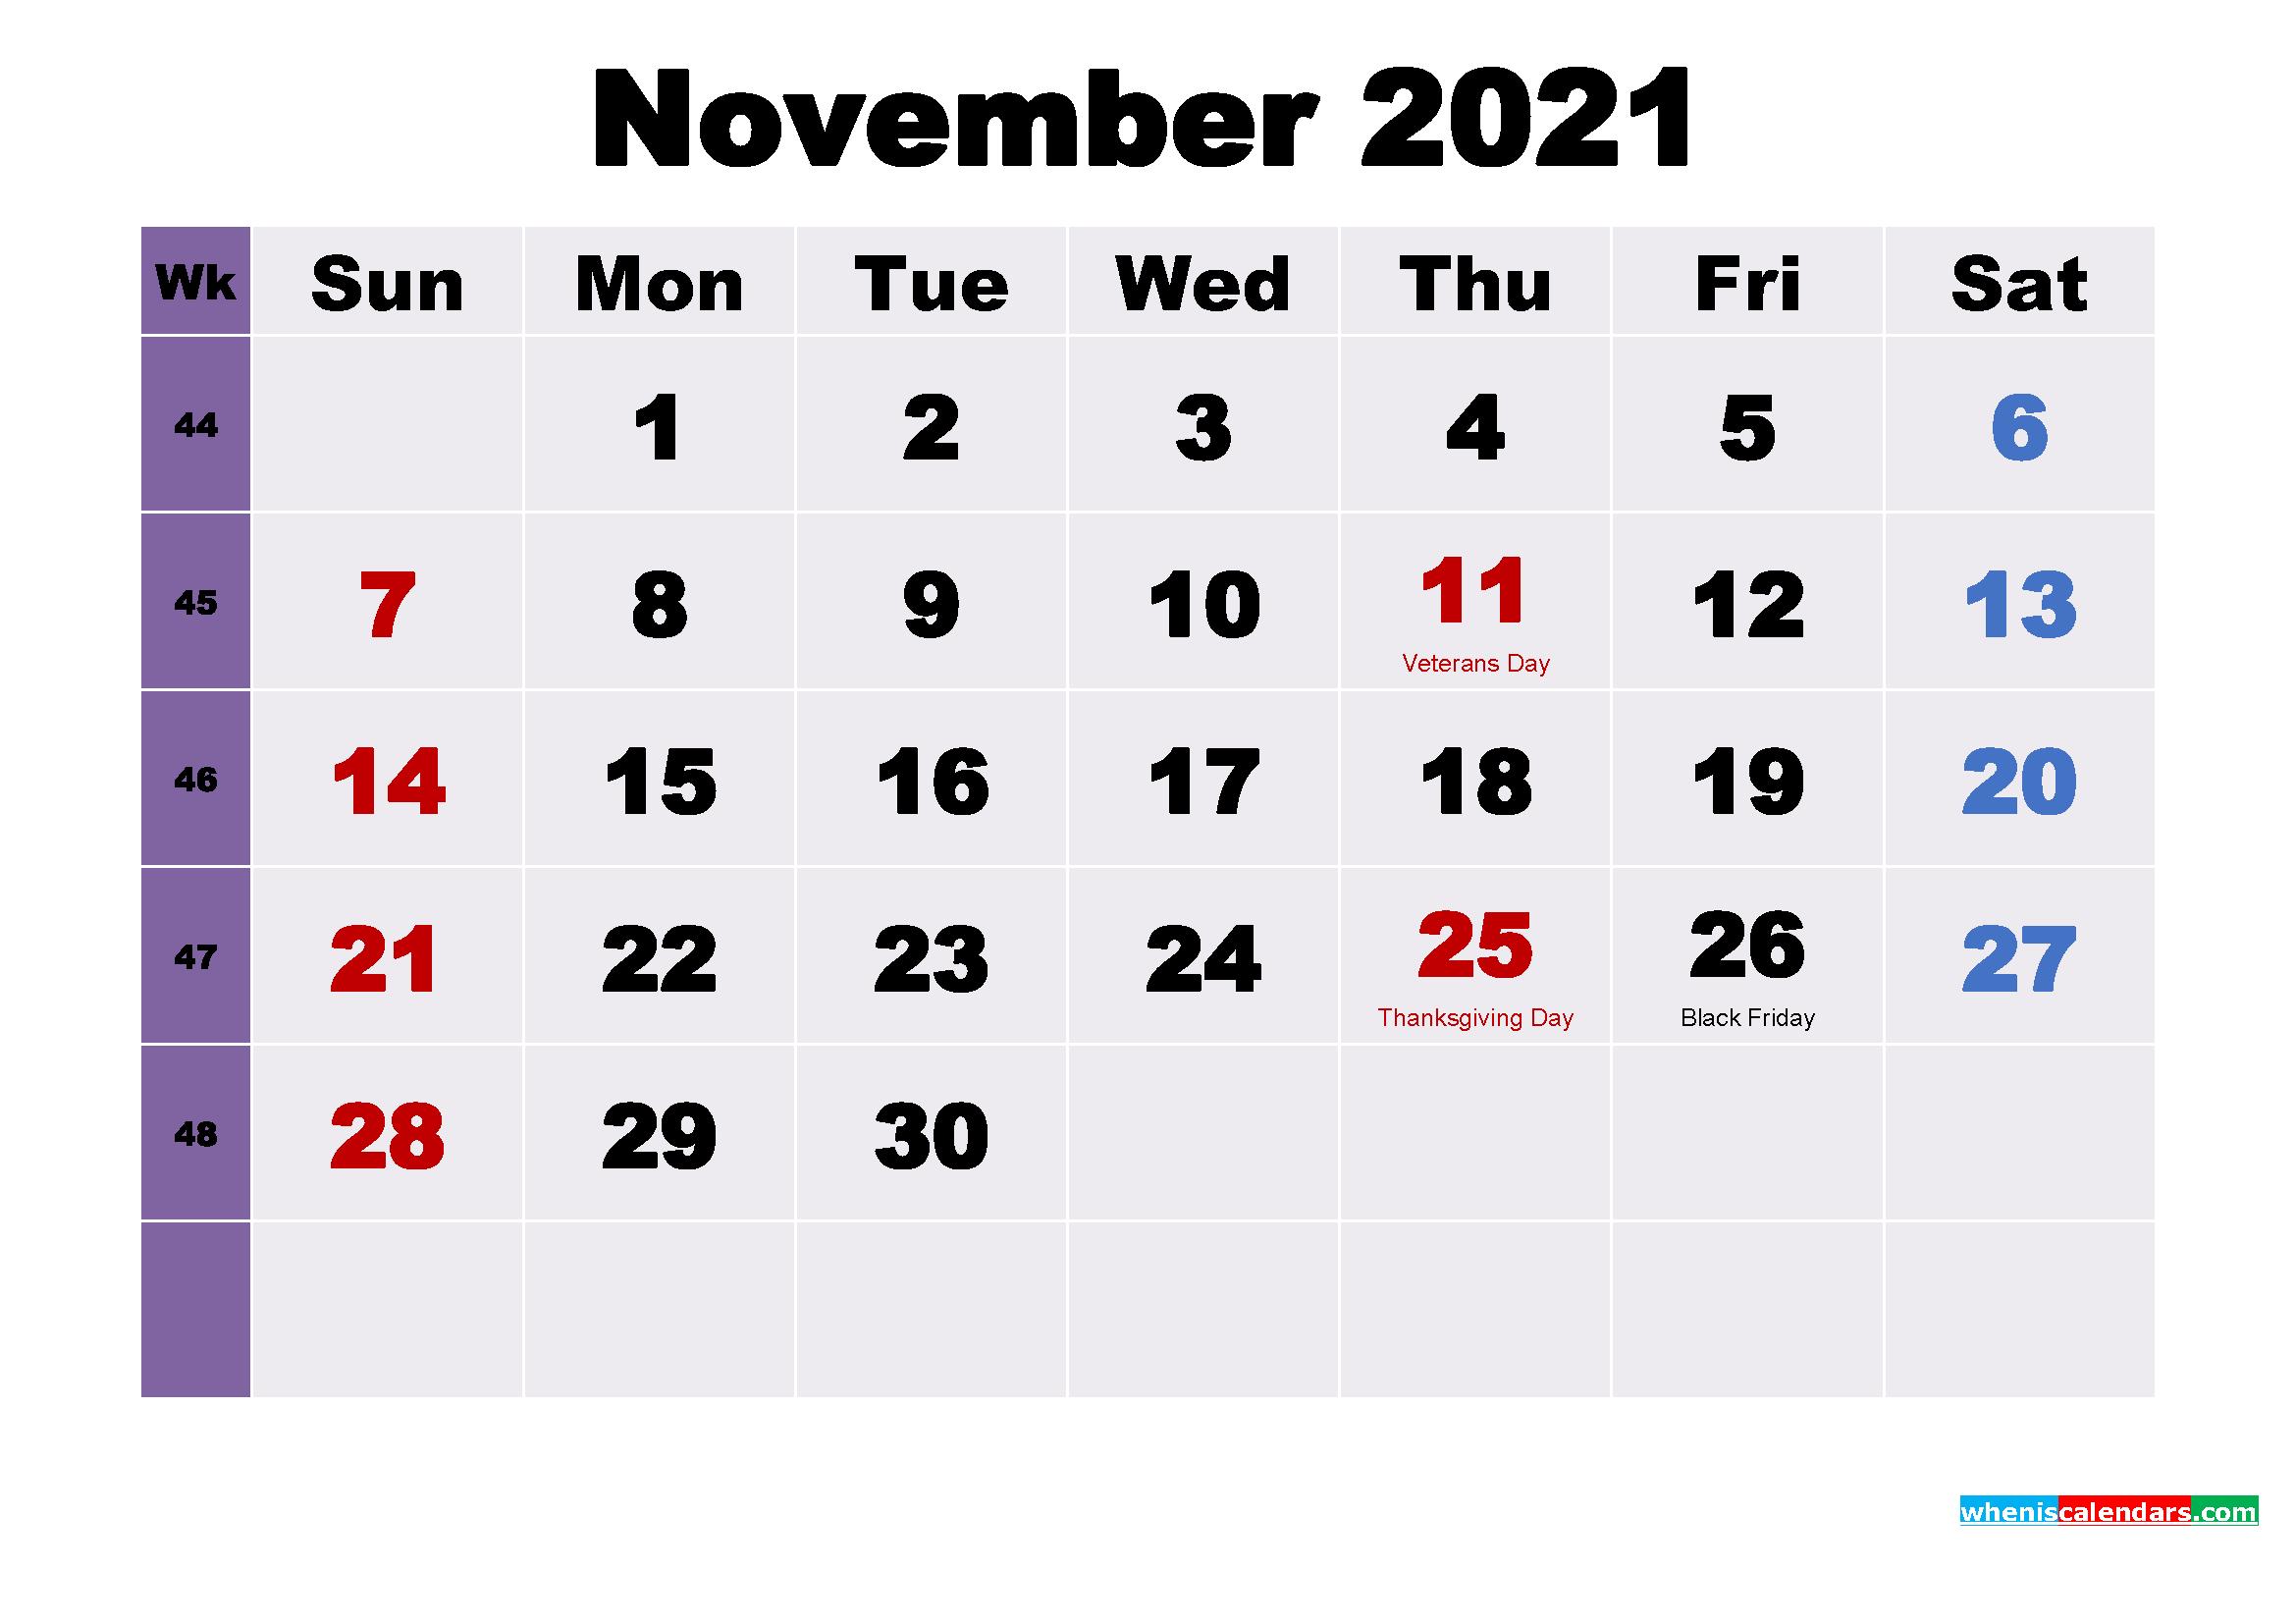 November 2021 Desktop Calendar Free Download